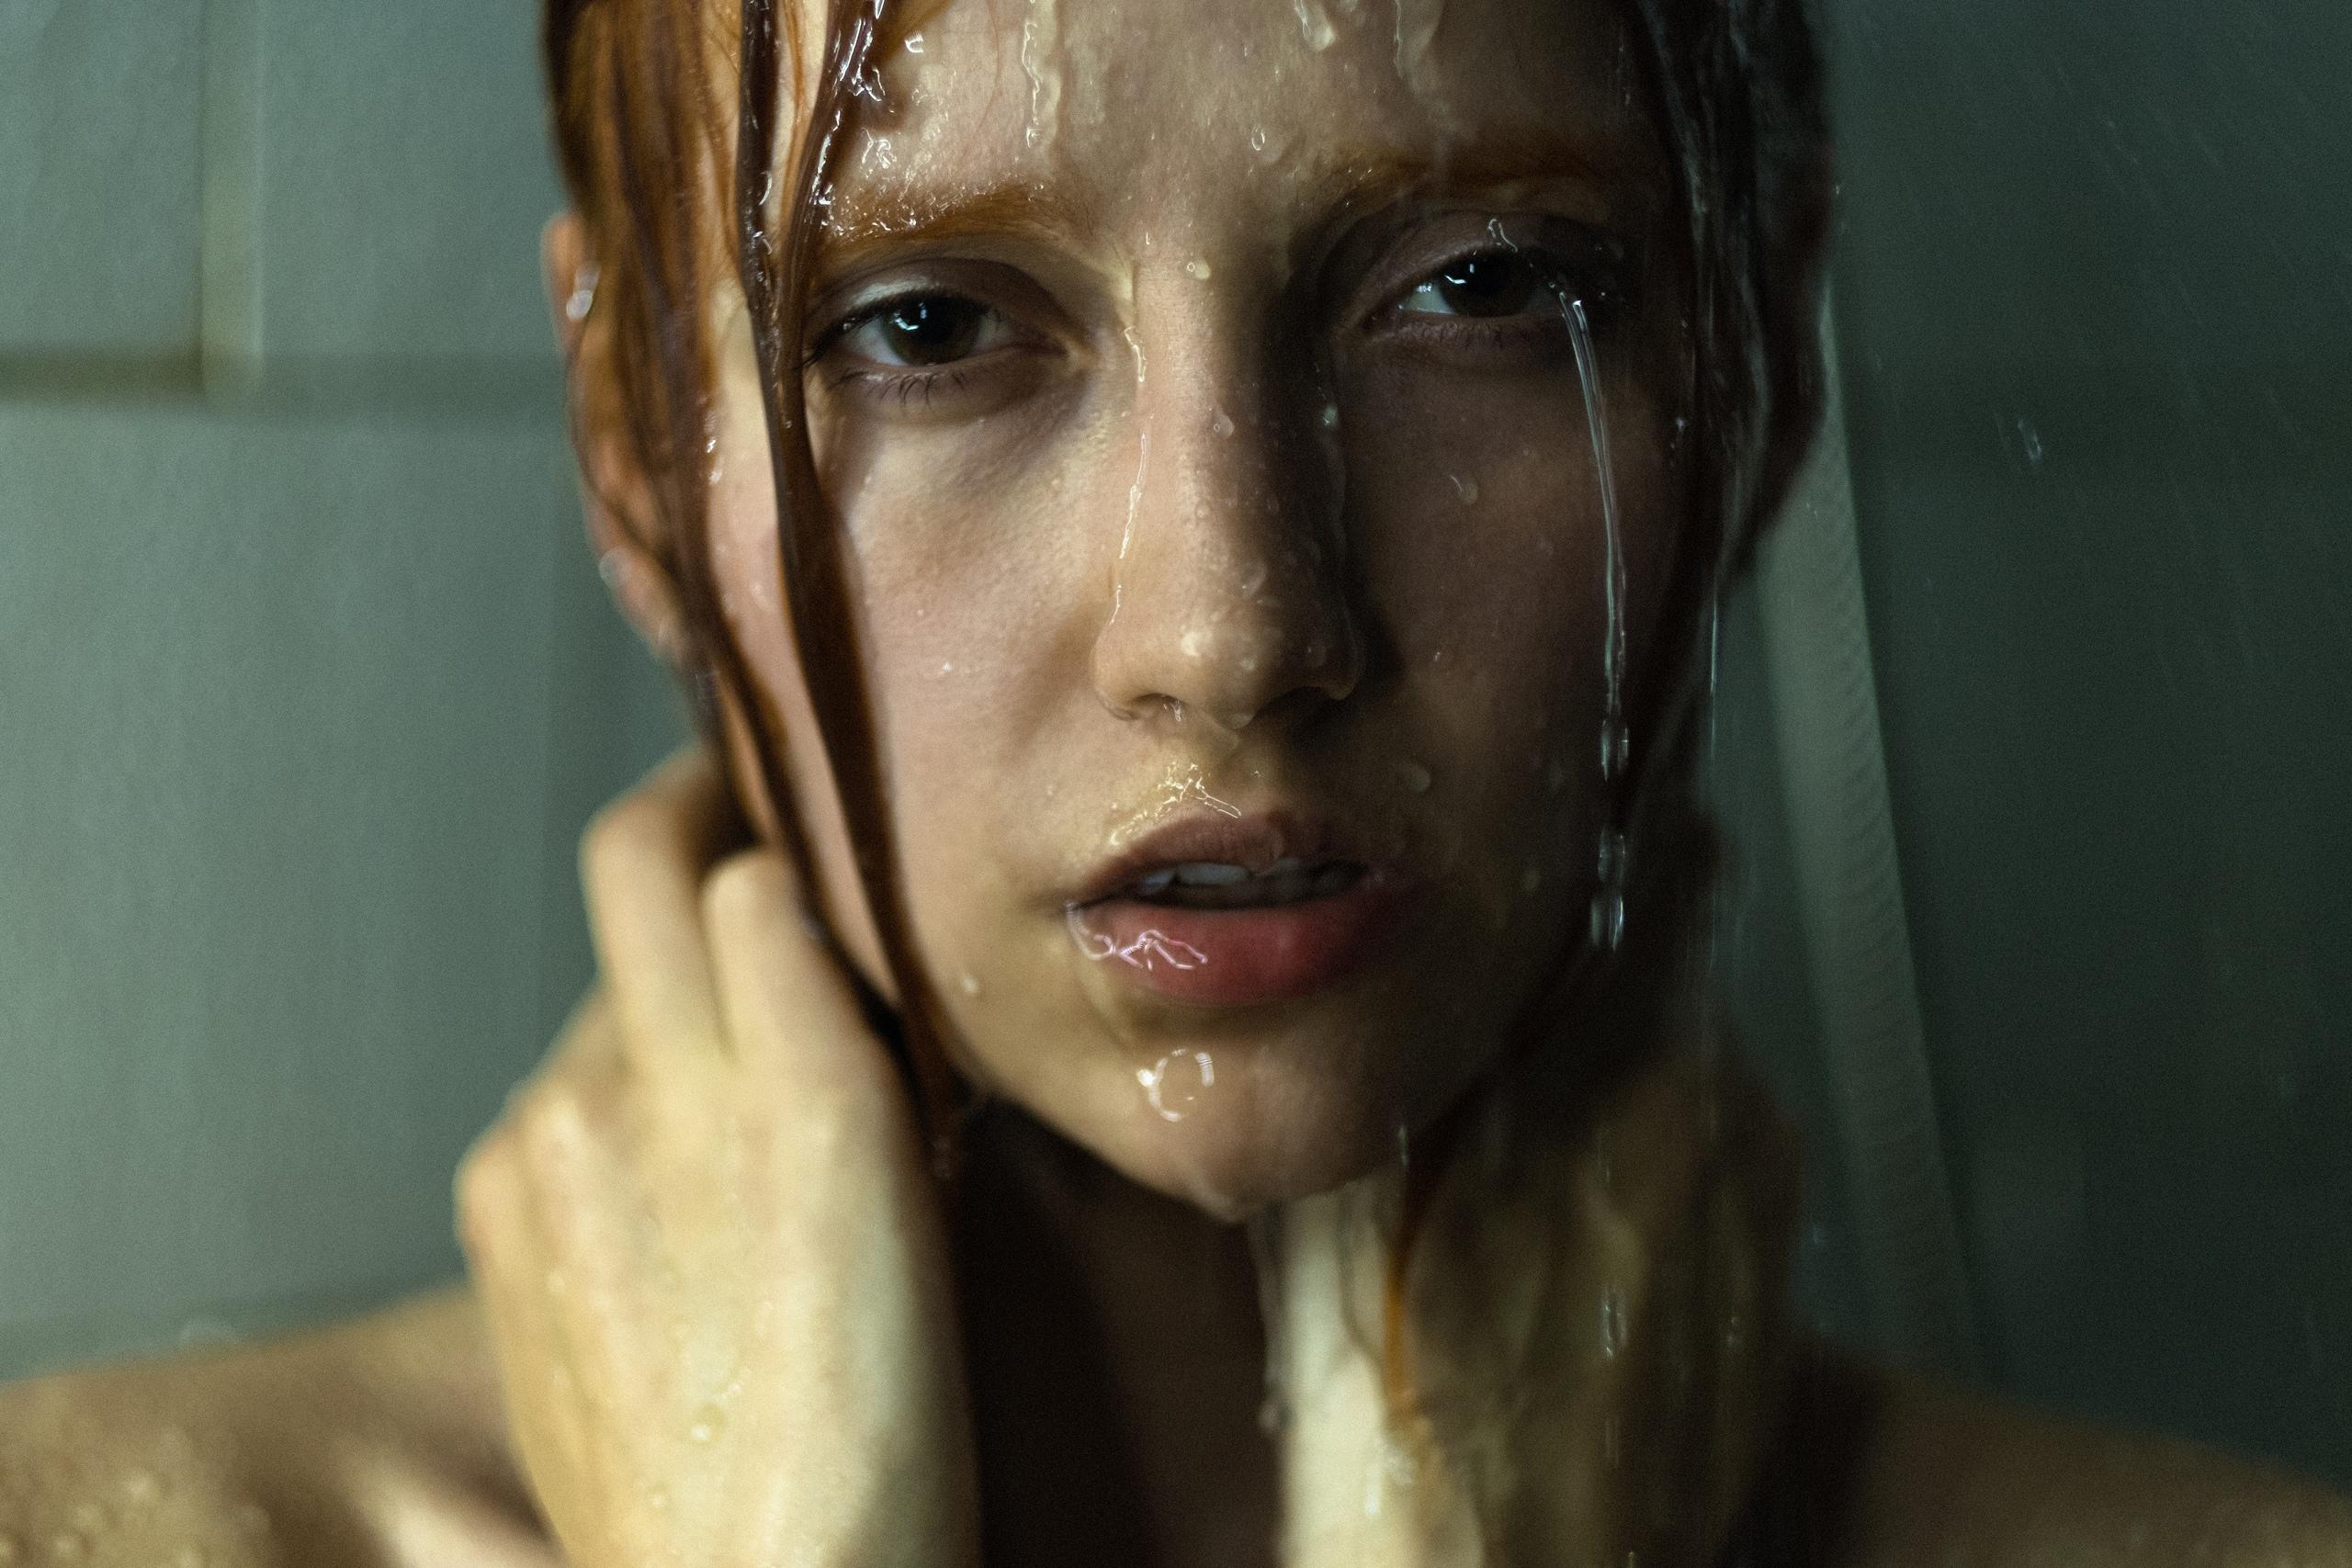 https://youngfolks.ru/pub/model-alexia-iordanova-model-kirill-frantsuzov-33908402